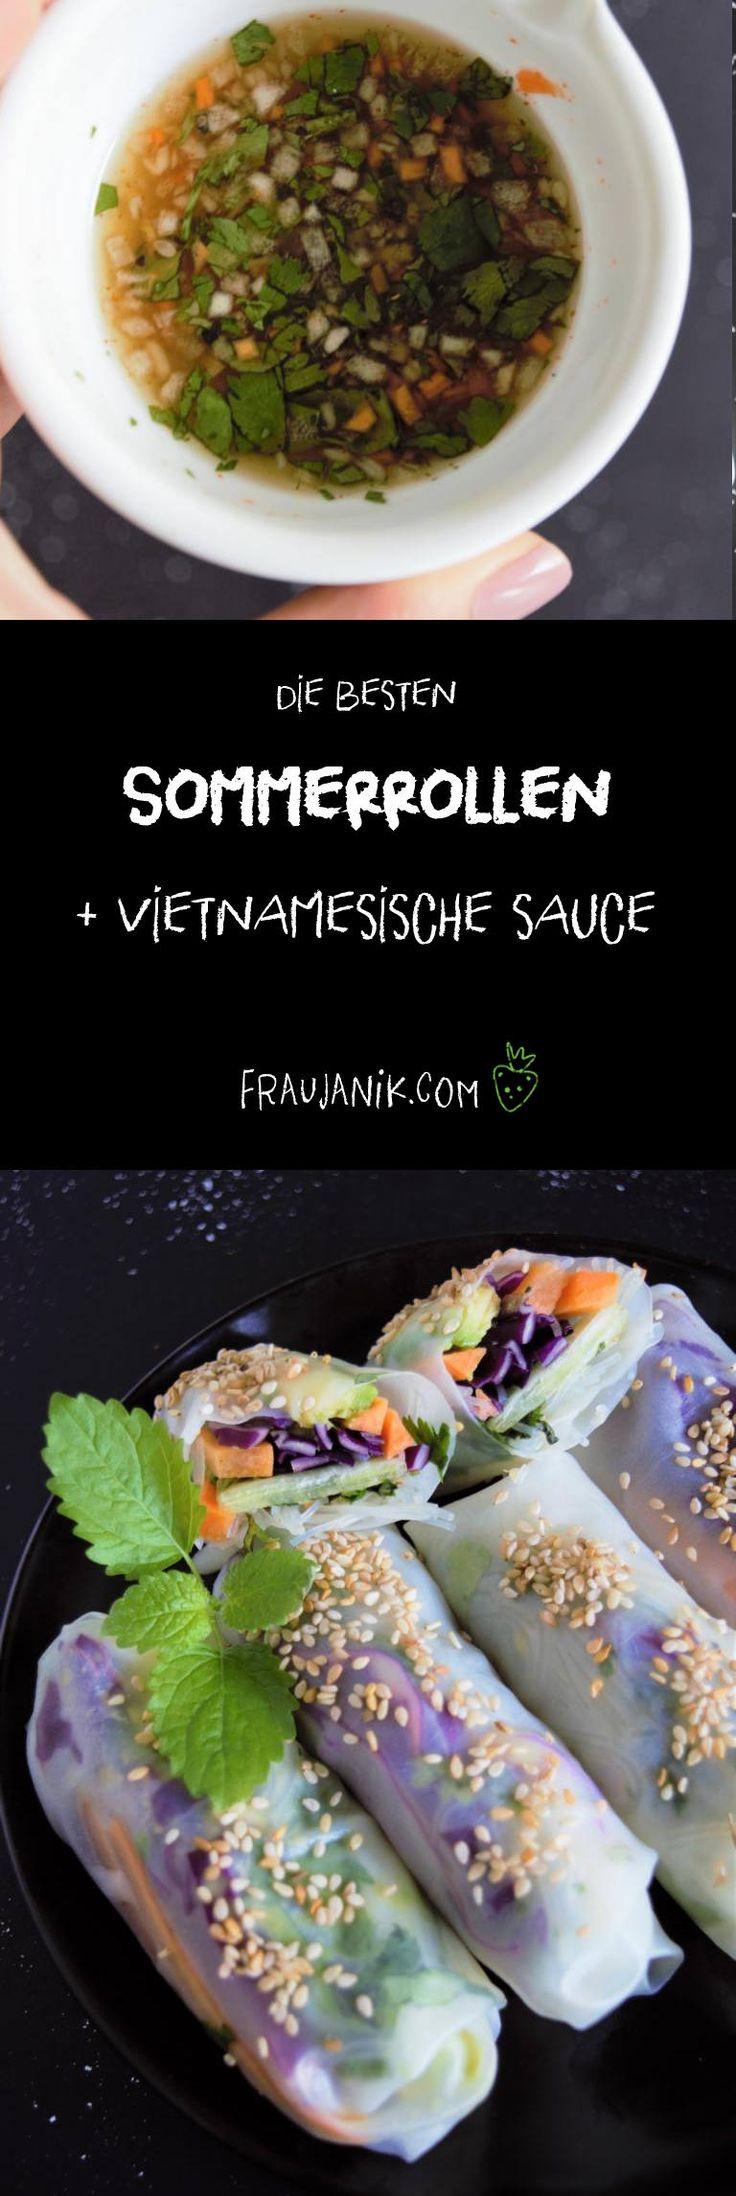 Sommerrollen + vietnamesische Sauce – Anna LE